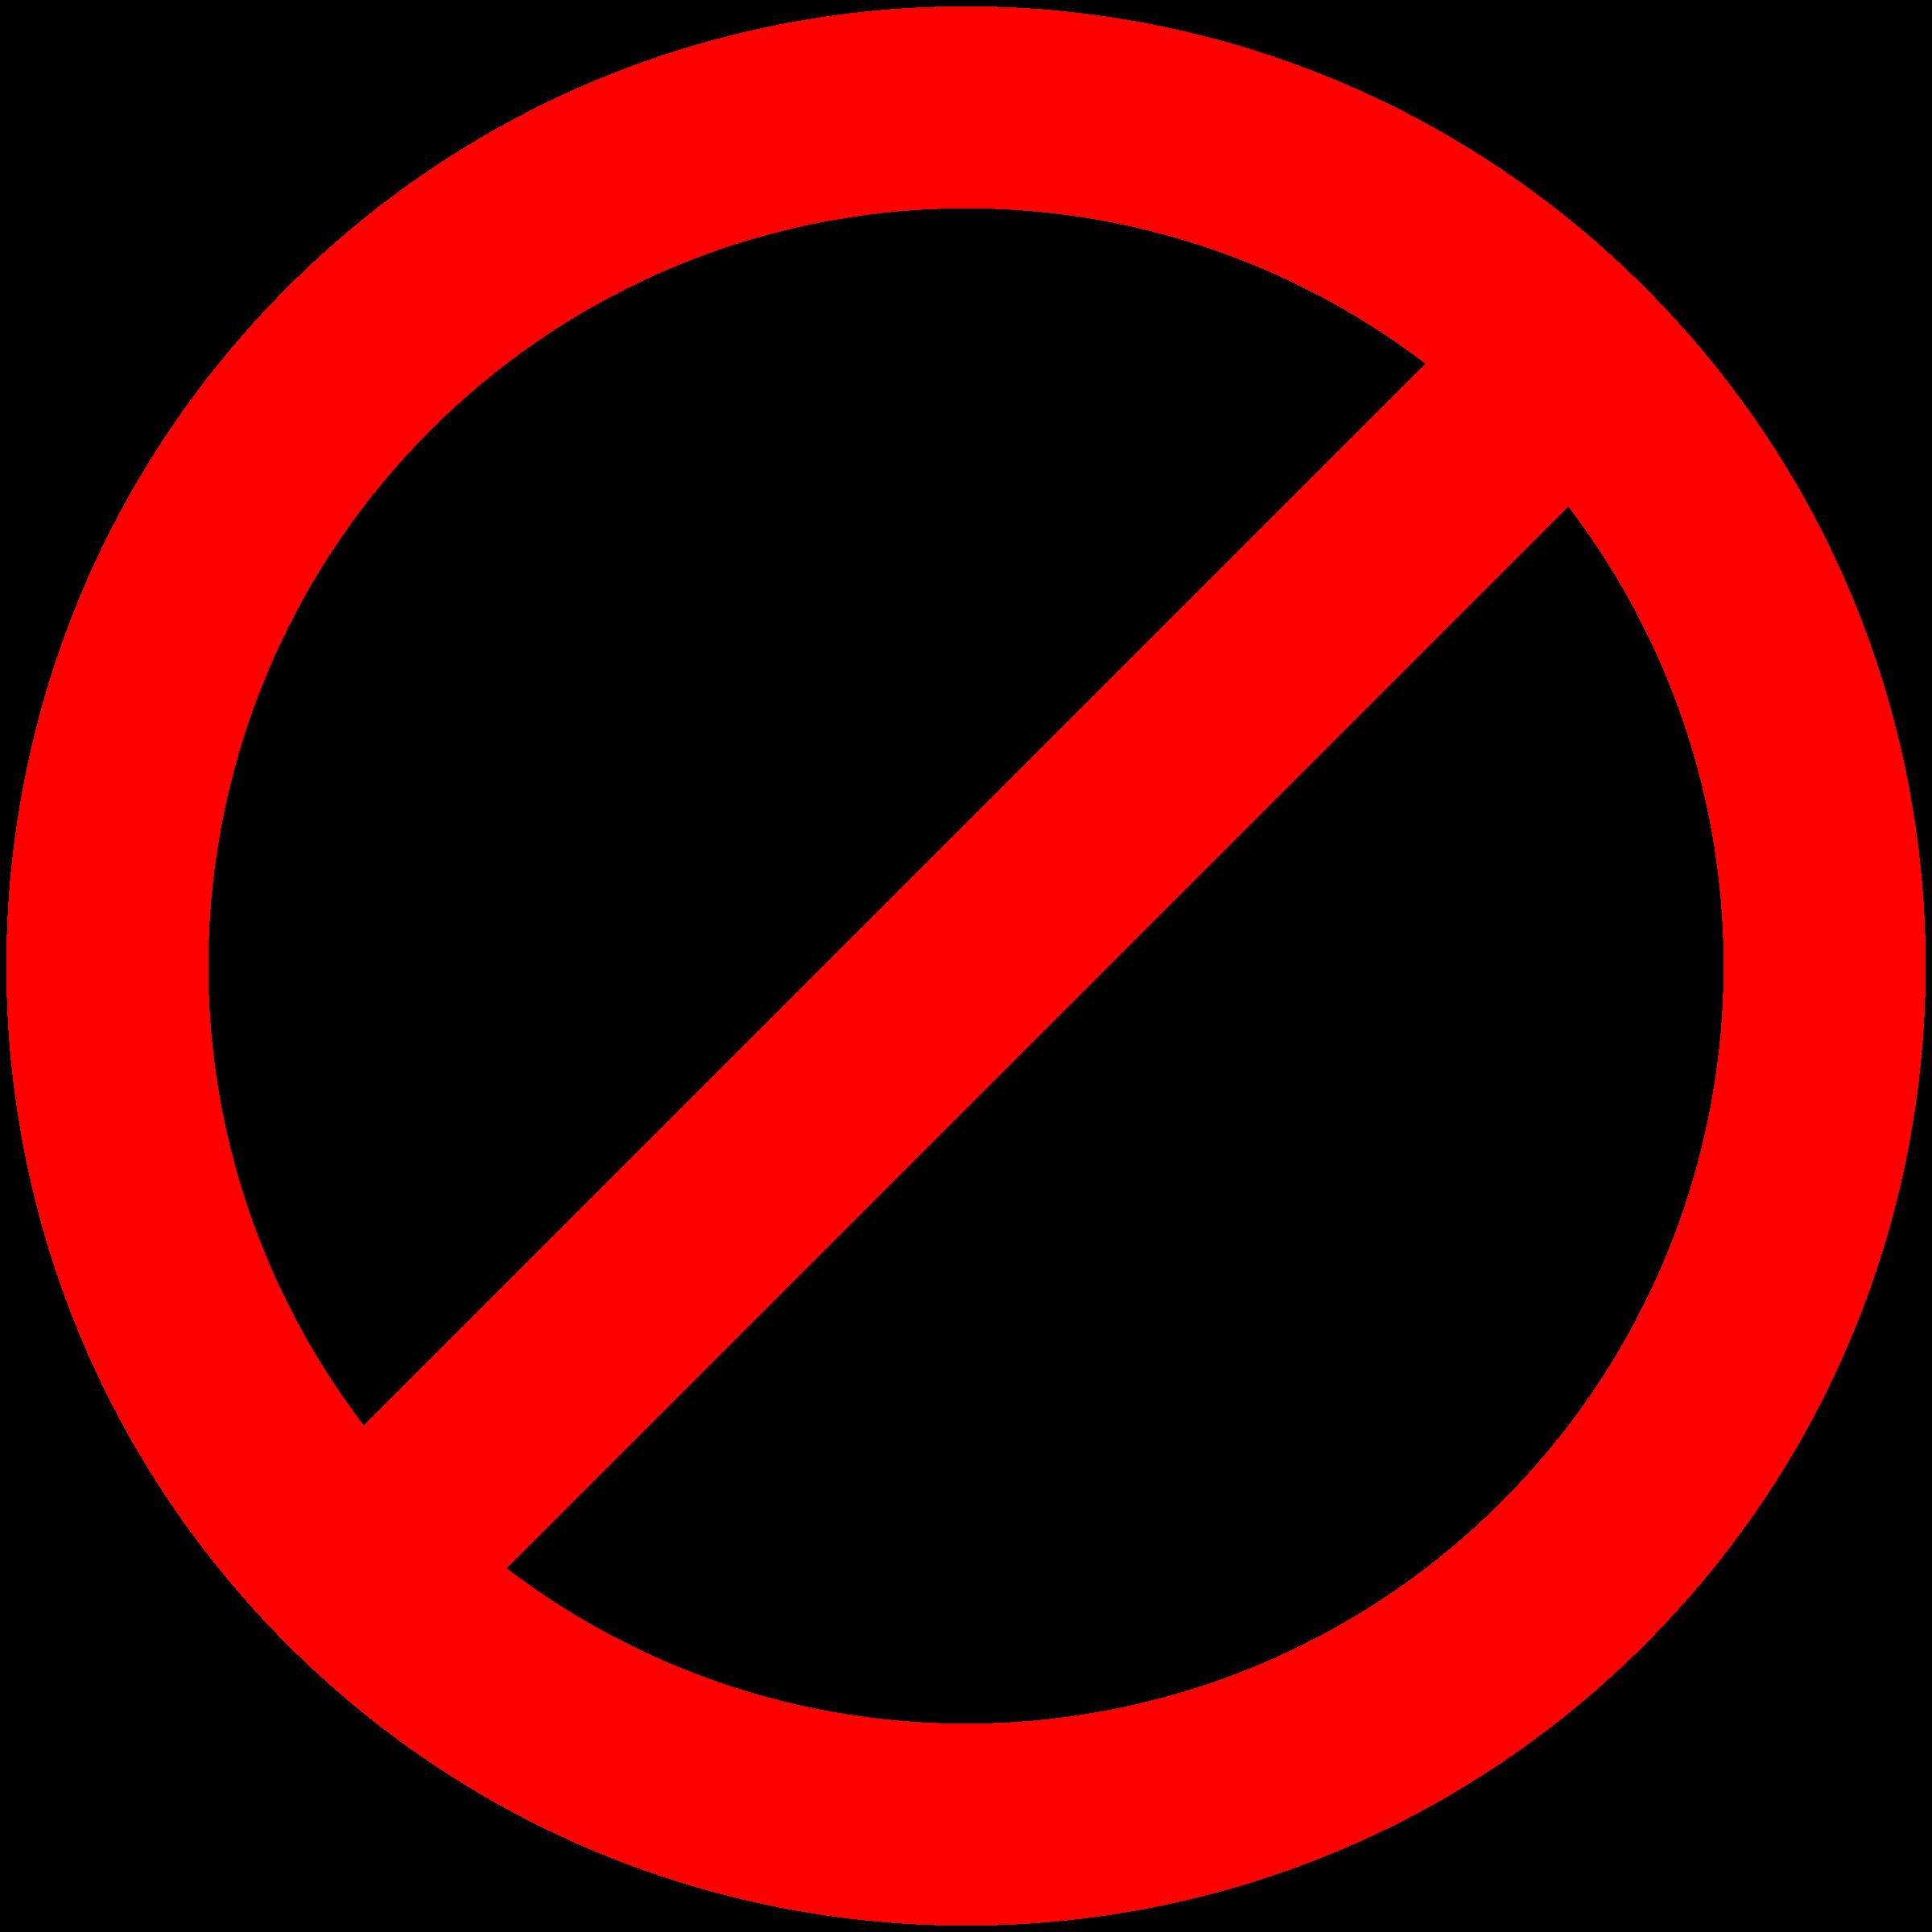 15 Transparent No Sign Free Cliparts Tha-15 Transparent No Sign Free Cliparts That You Can Download To You-0